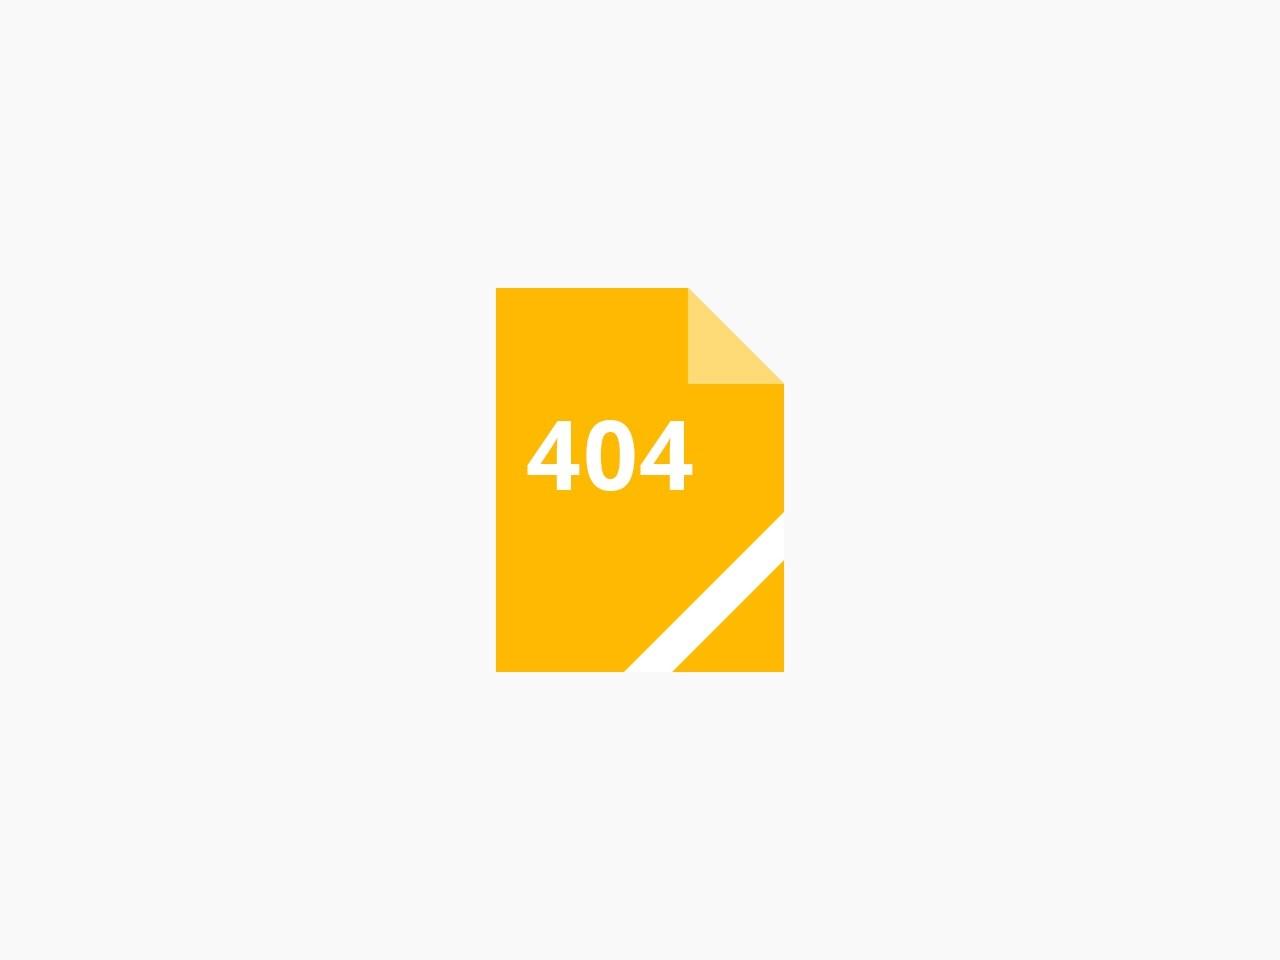 Zynga confirms its acquiring Clumsy Ninja developer NaturalMotion